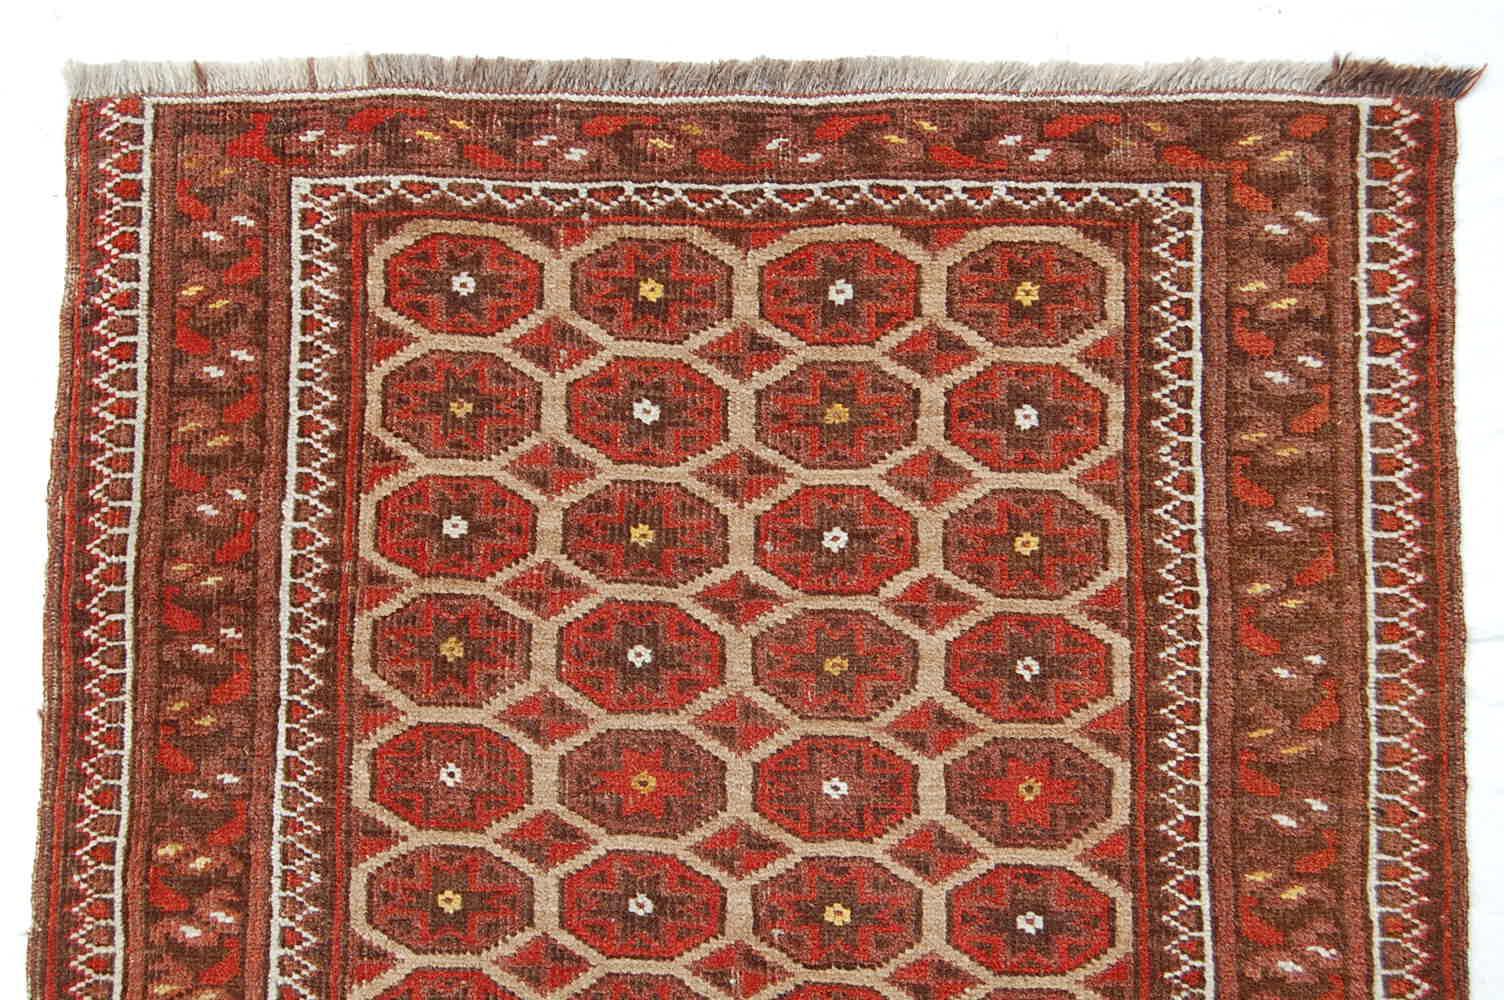 antik afghanistan ersari teppich 99x69cm rarit t ebay. Black Bedroom Furniture Sets. Home Design Ideas